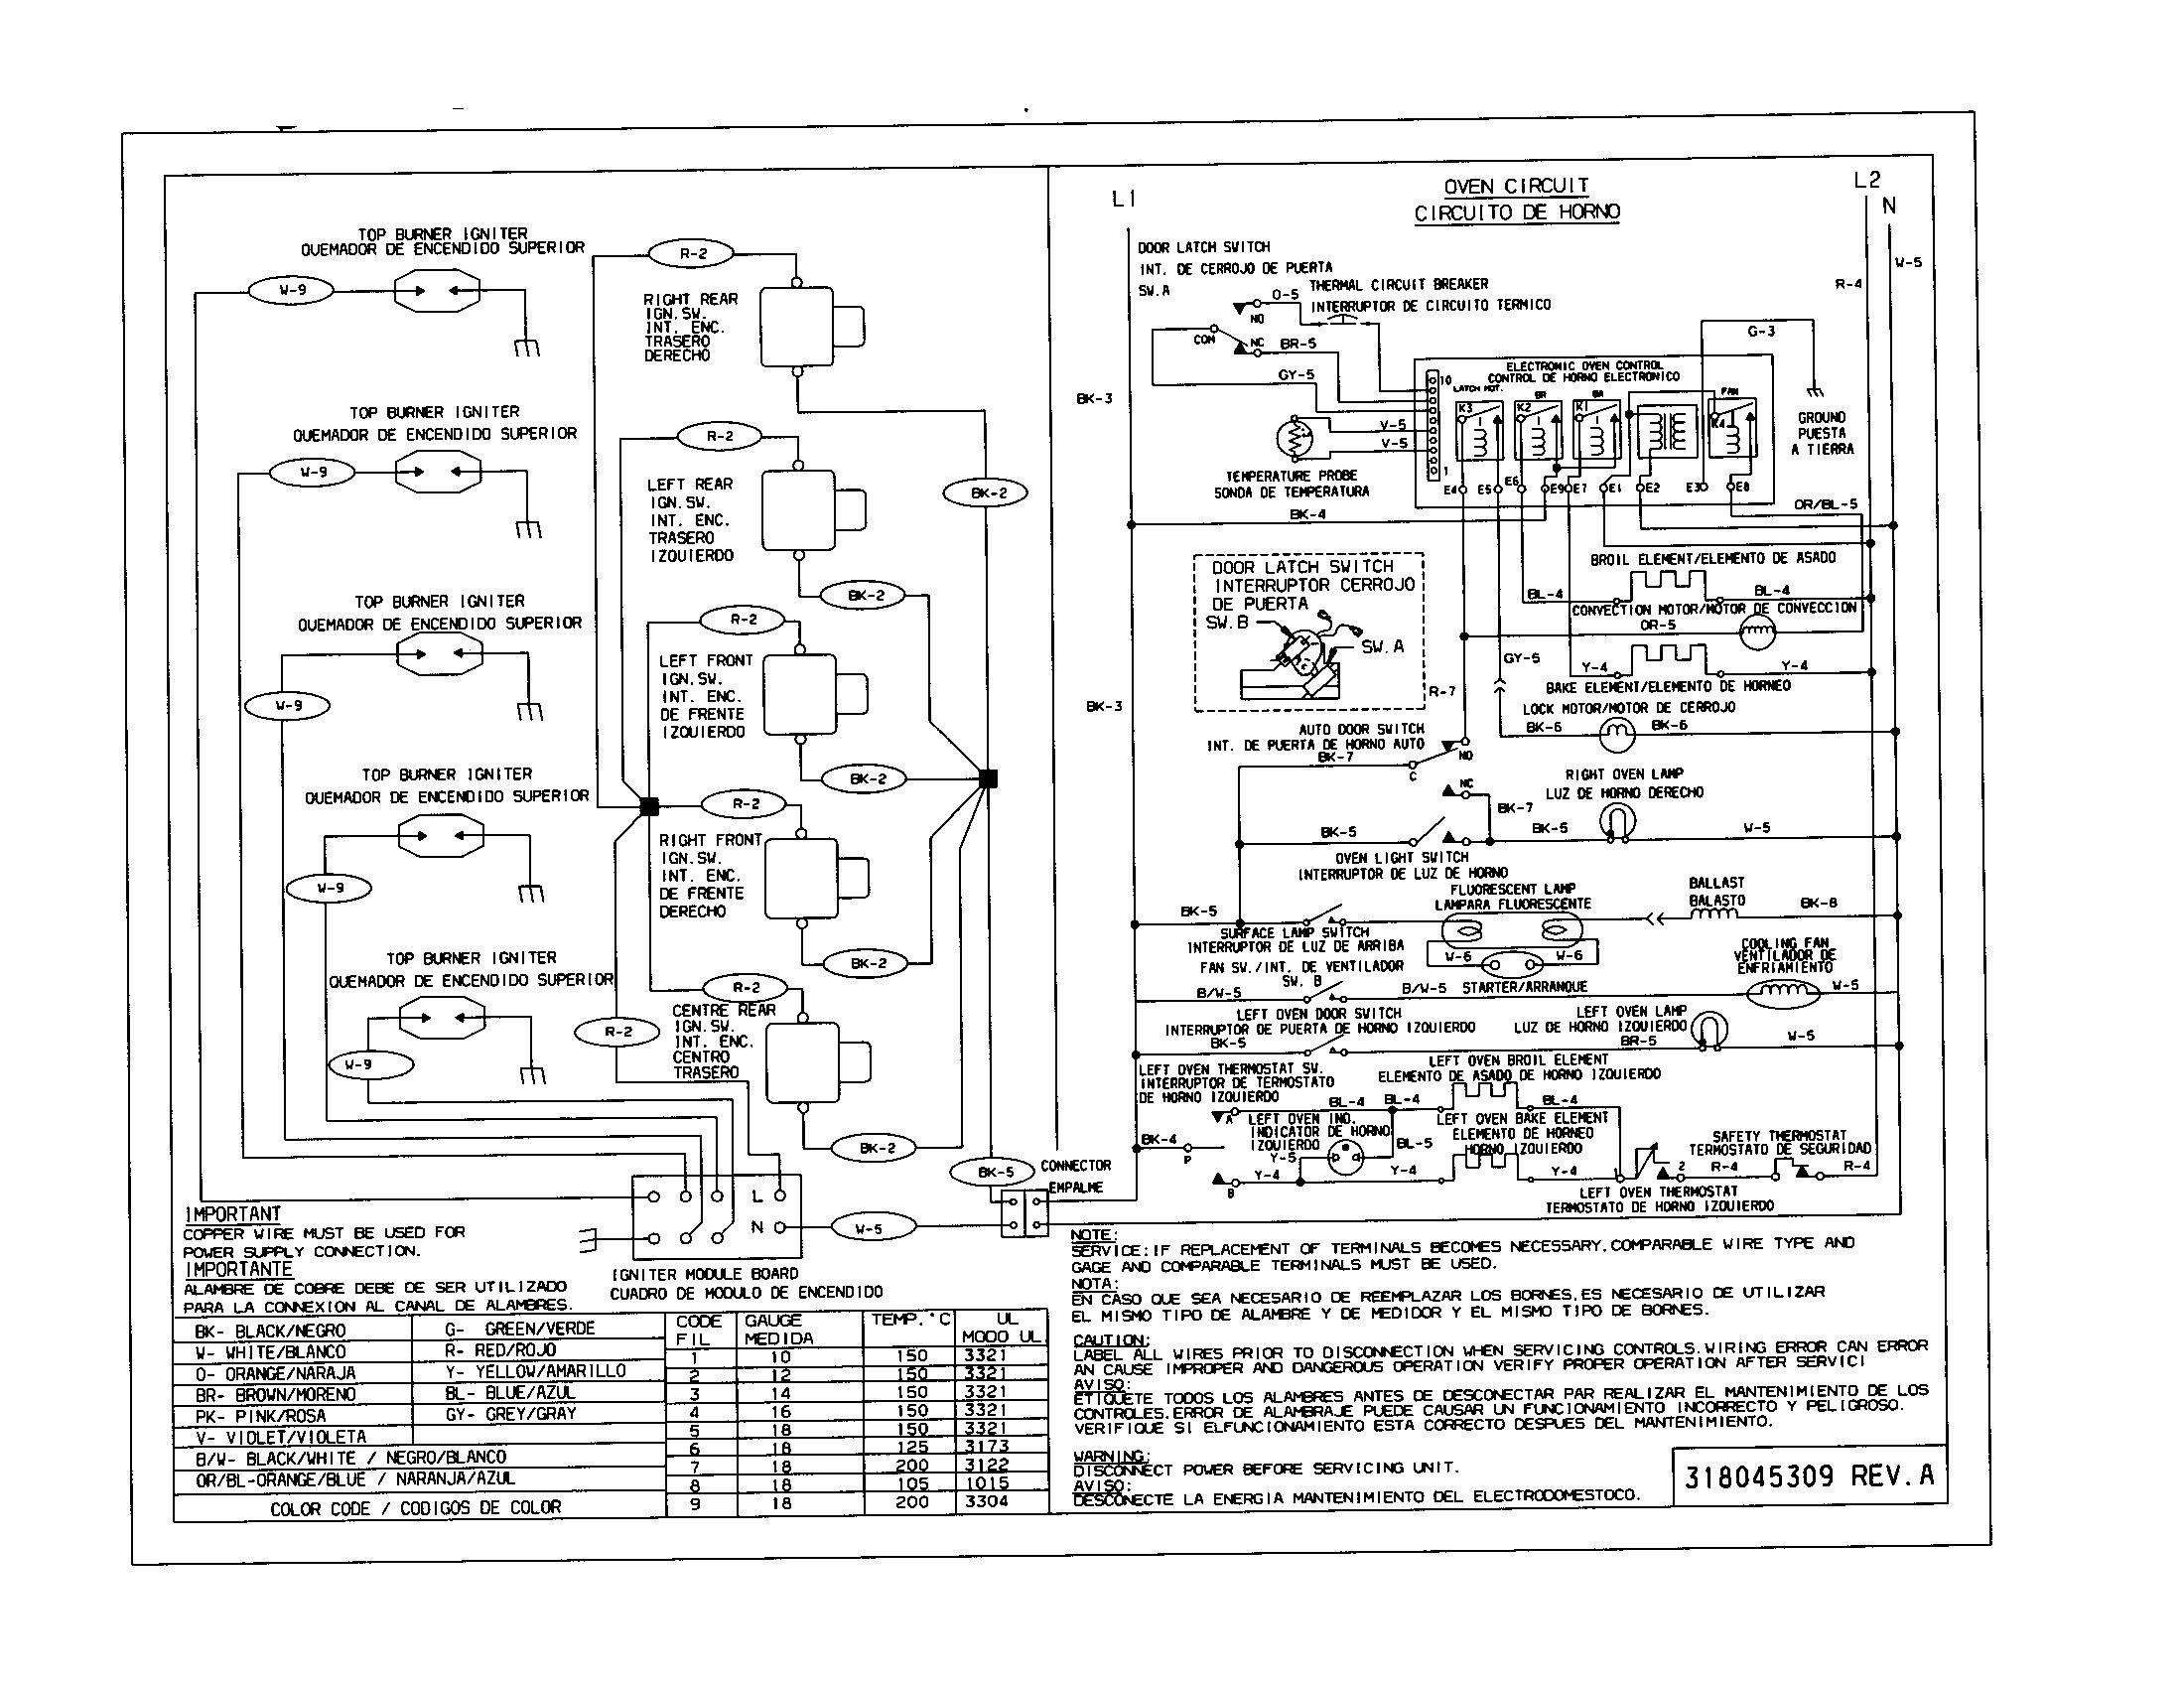 Honda F20b Wiring Diagram Wiring Diagram And Fuse Box - Wiring Diagram Honda F20b